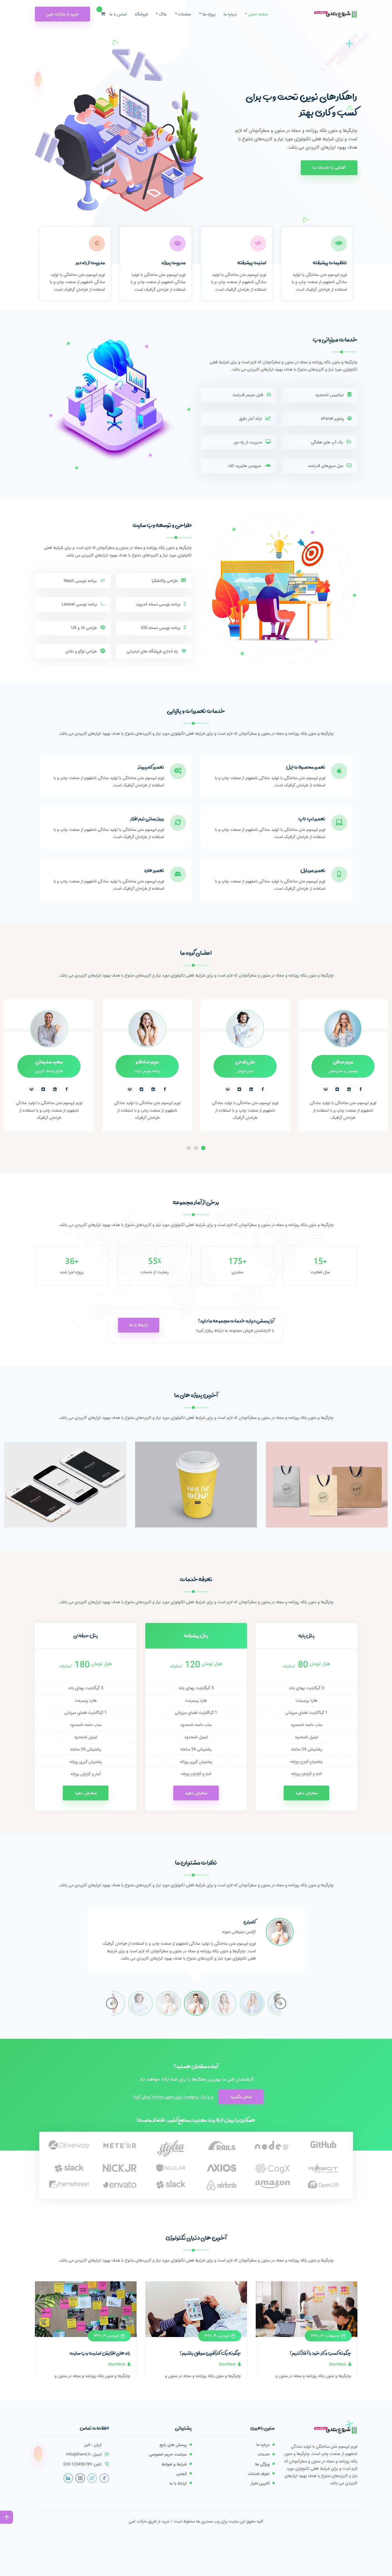 StartNext | قالب وردپرس خدمات دیجیتال و استارت آپ